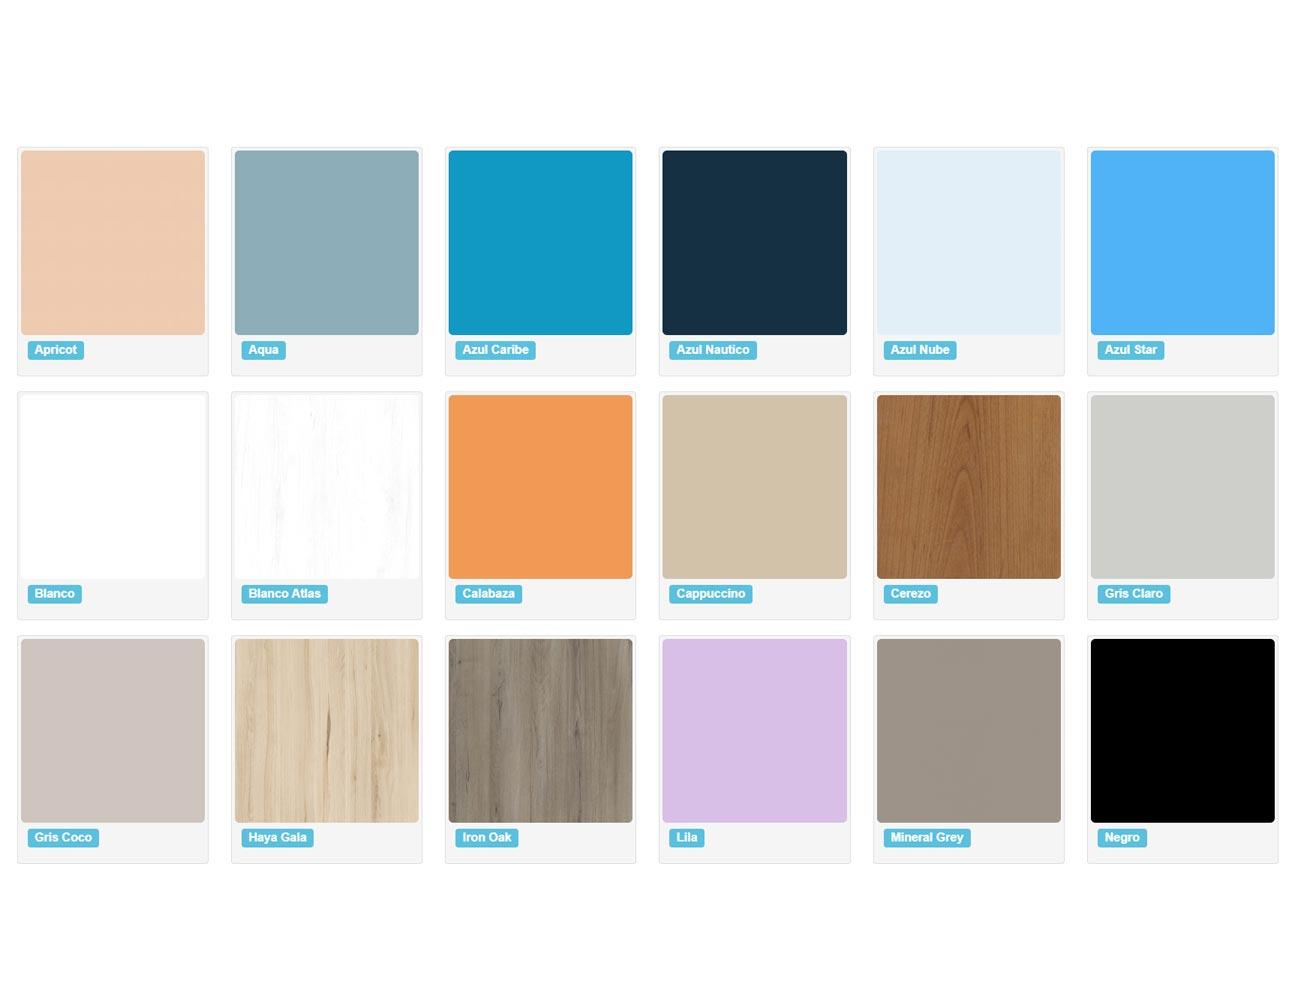 Colores215